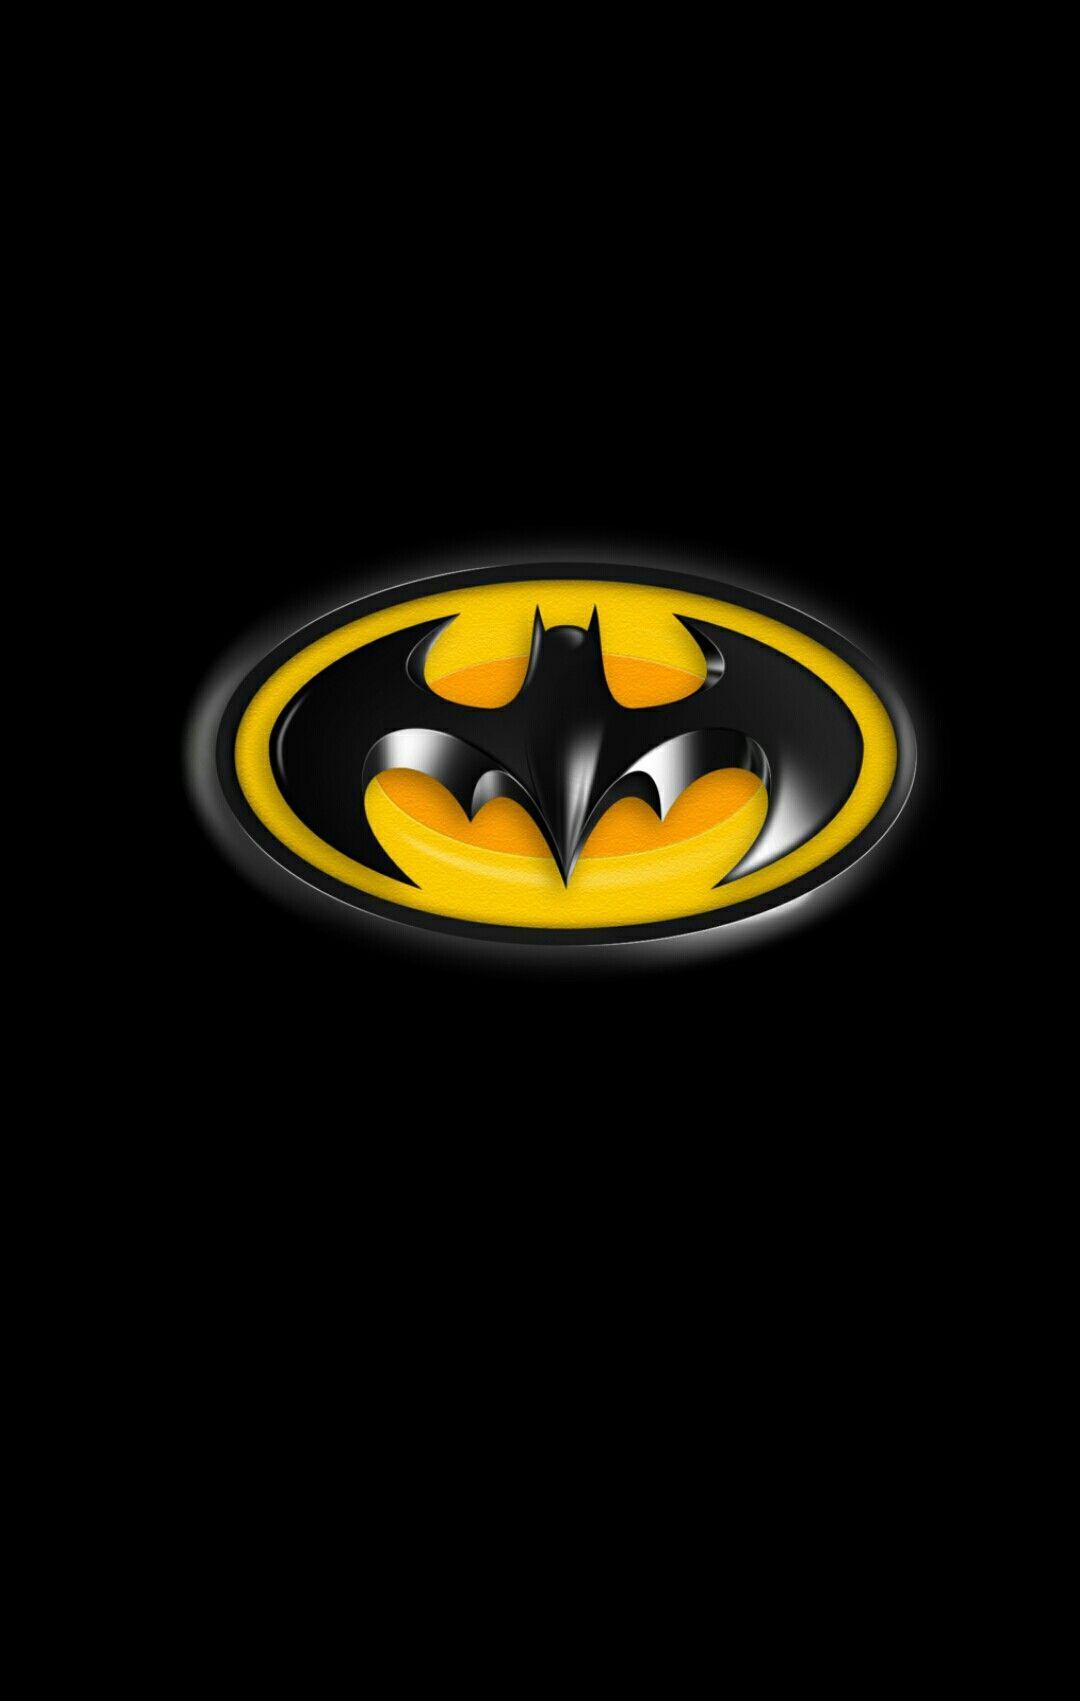 Pin By Nicholas Rathbun On Bat Symbol Batman Wallpaper Batman Logo Batman Art